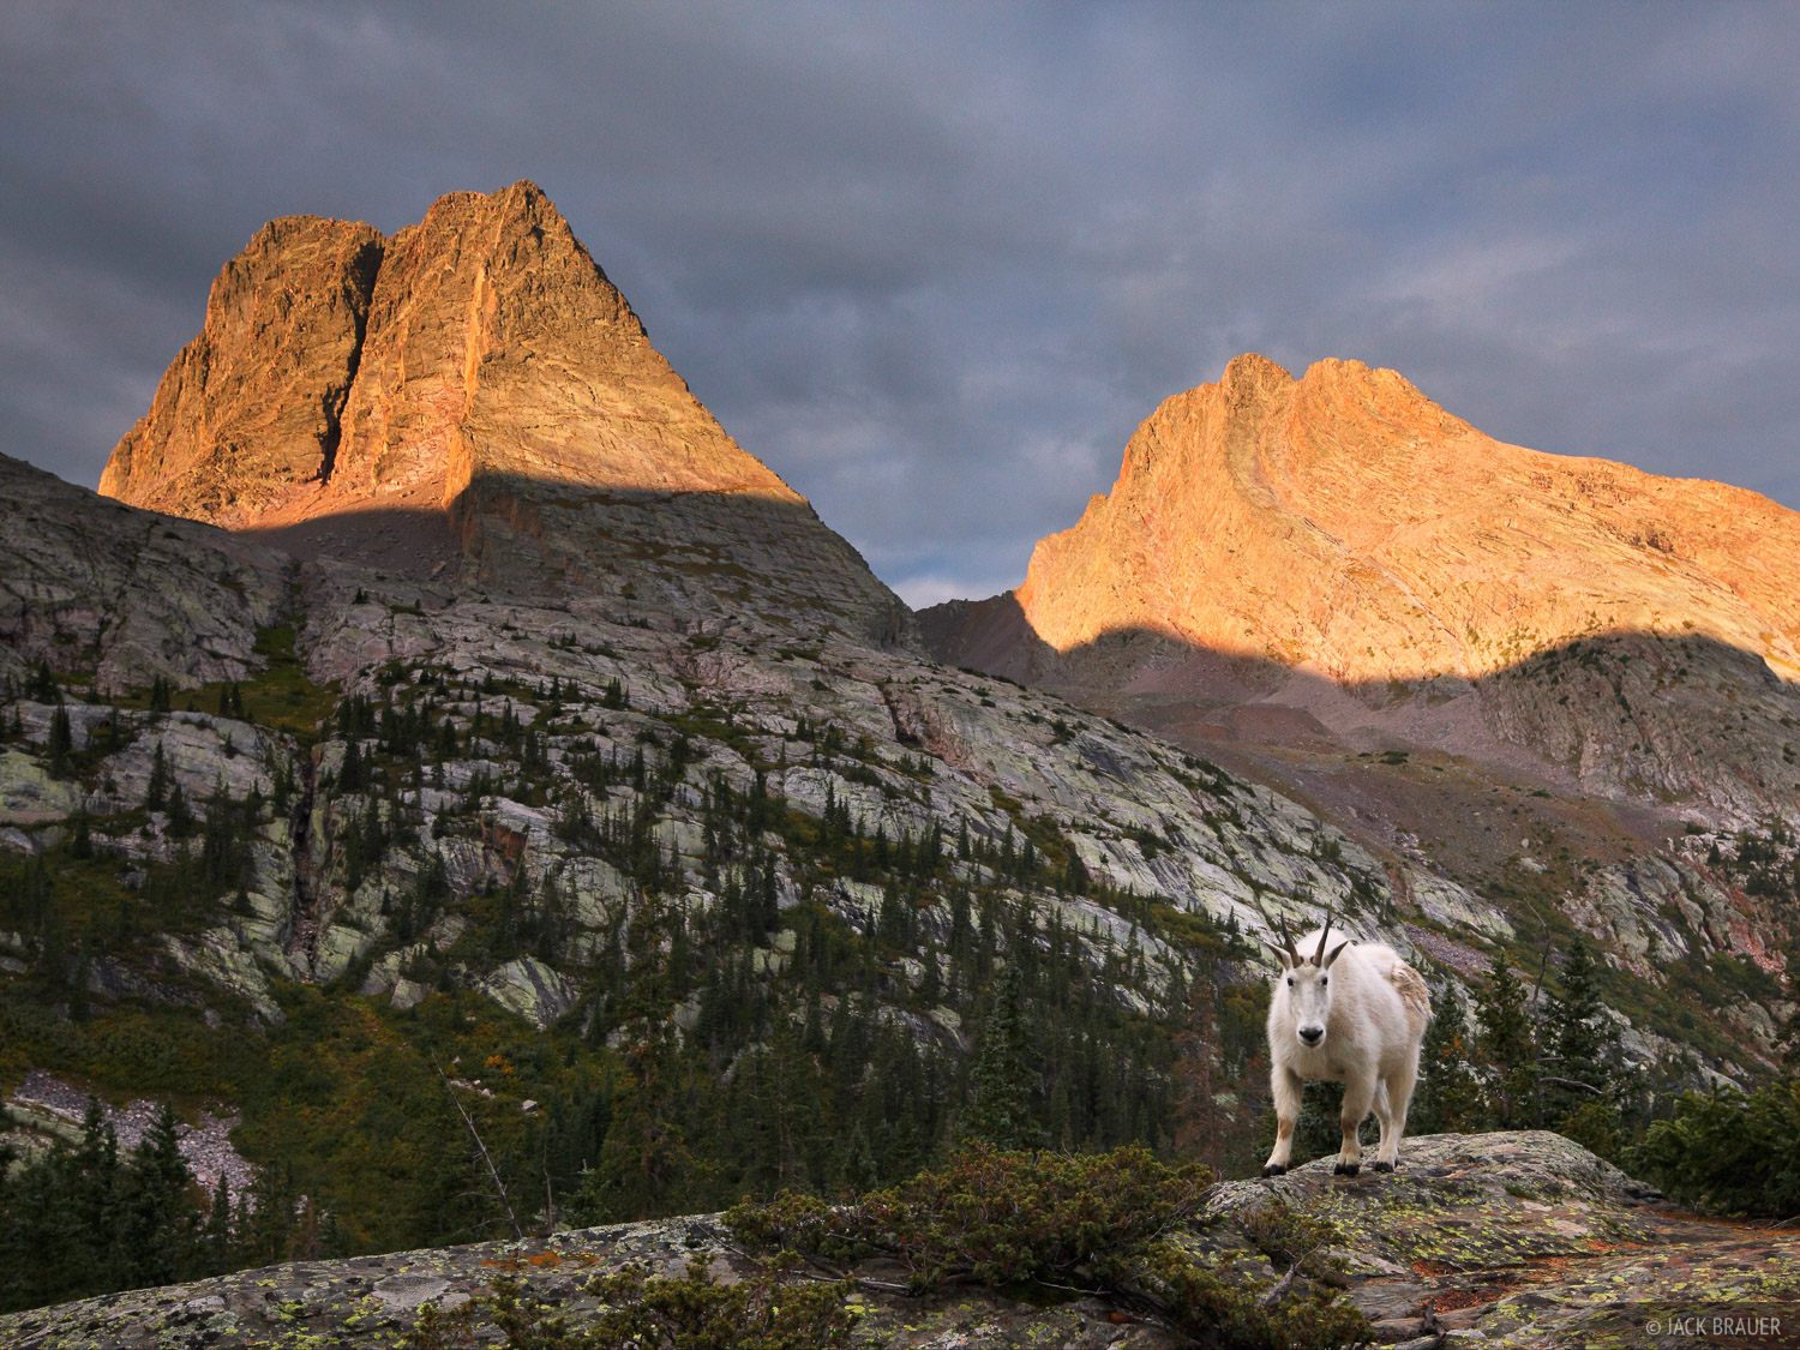 Mountain goat, Vestal Peak, Arrow Peak, Grenadier Range, San Juan Mountains, Weminuche Wilderness, Colorado, photo